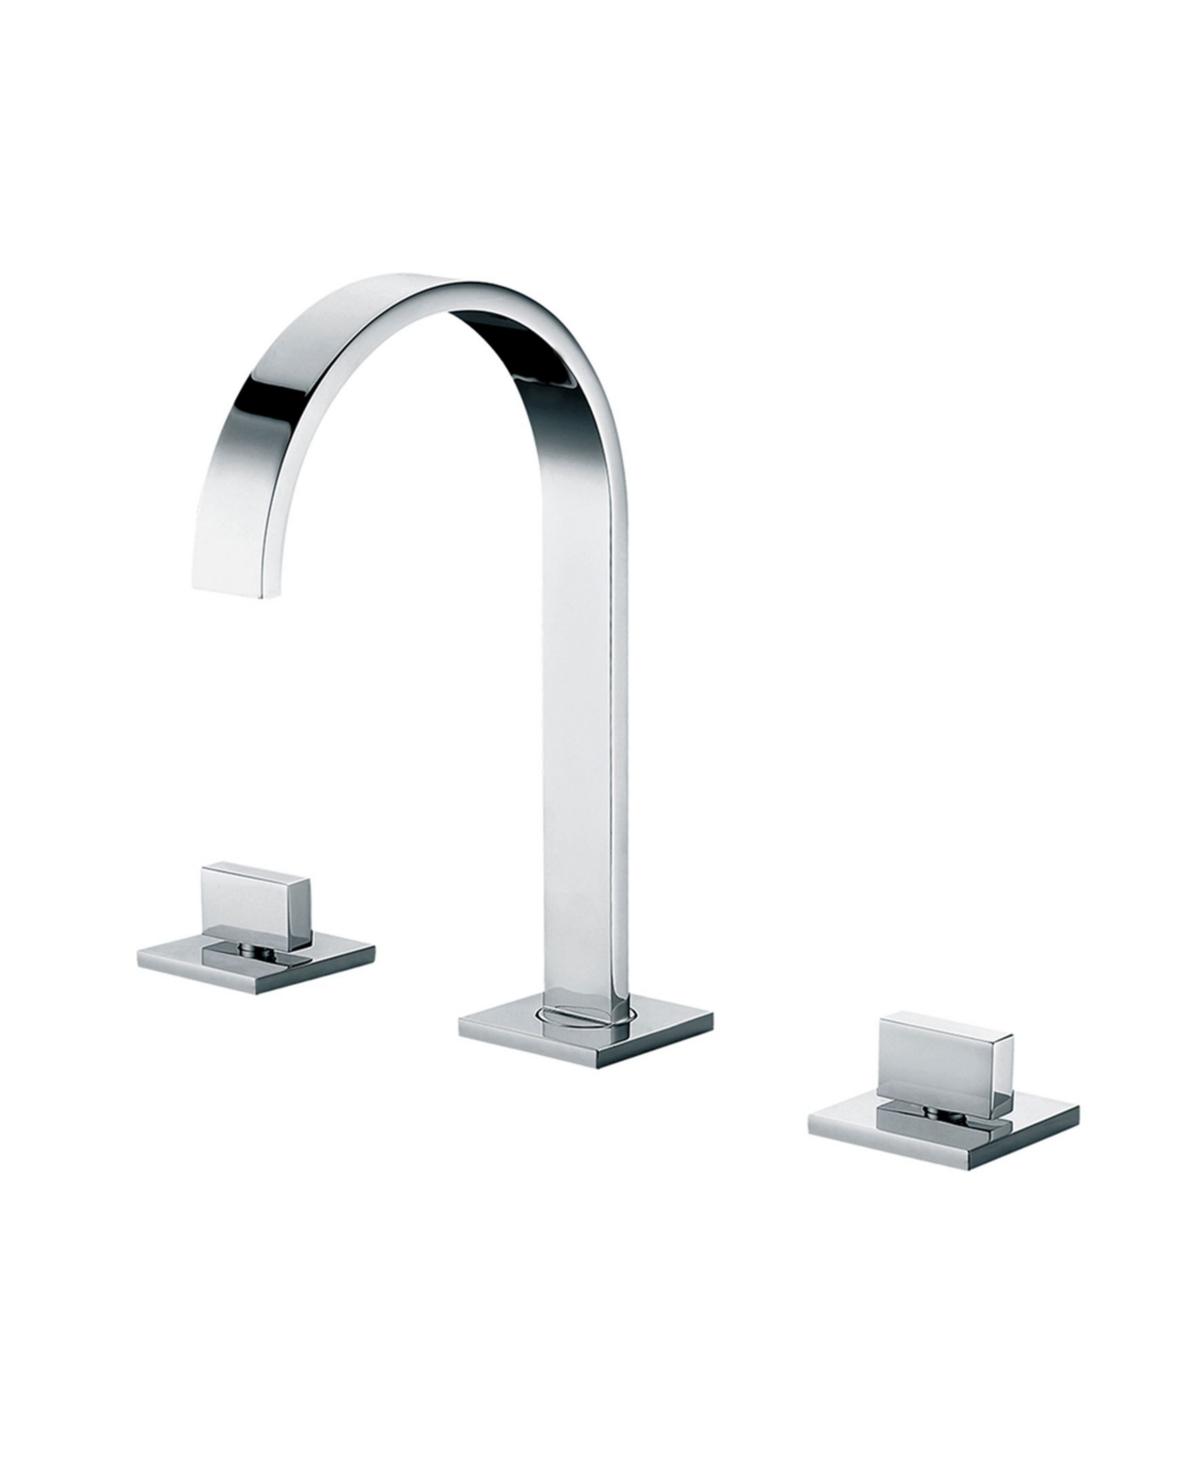 Alfi brand Polished Chrome Gooseneck Widespread Bathroom Faucet Bedding